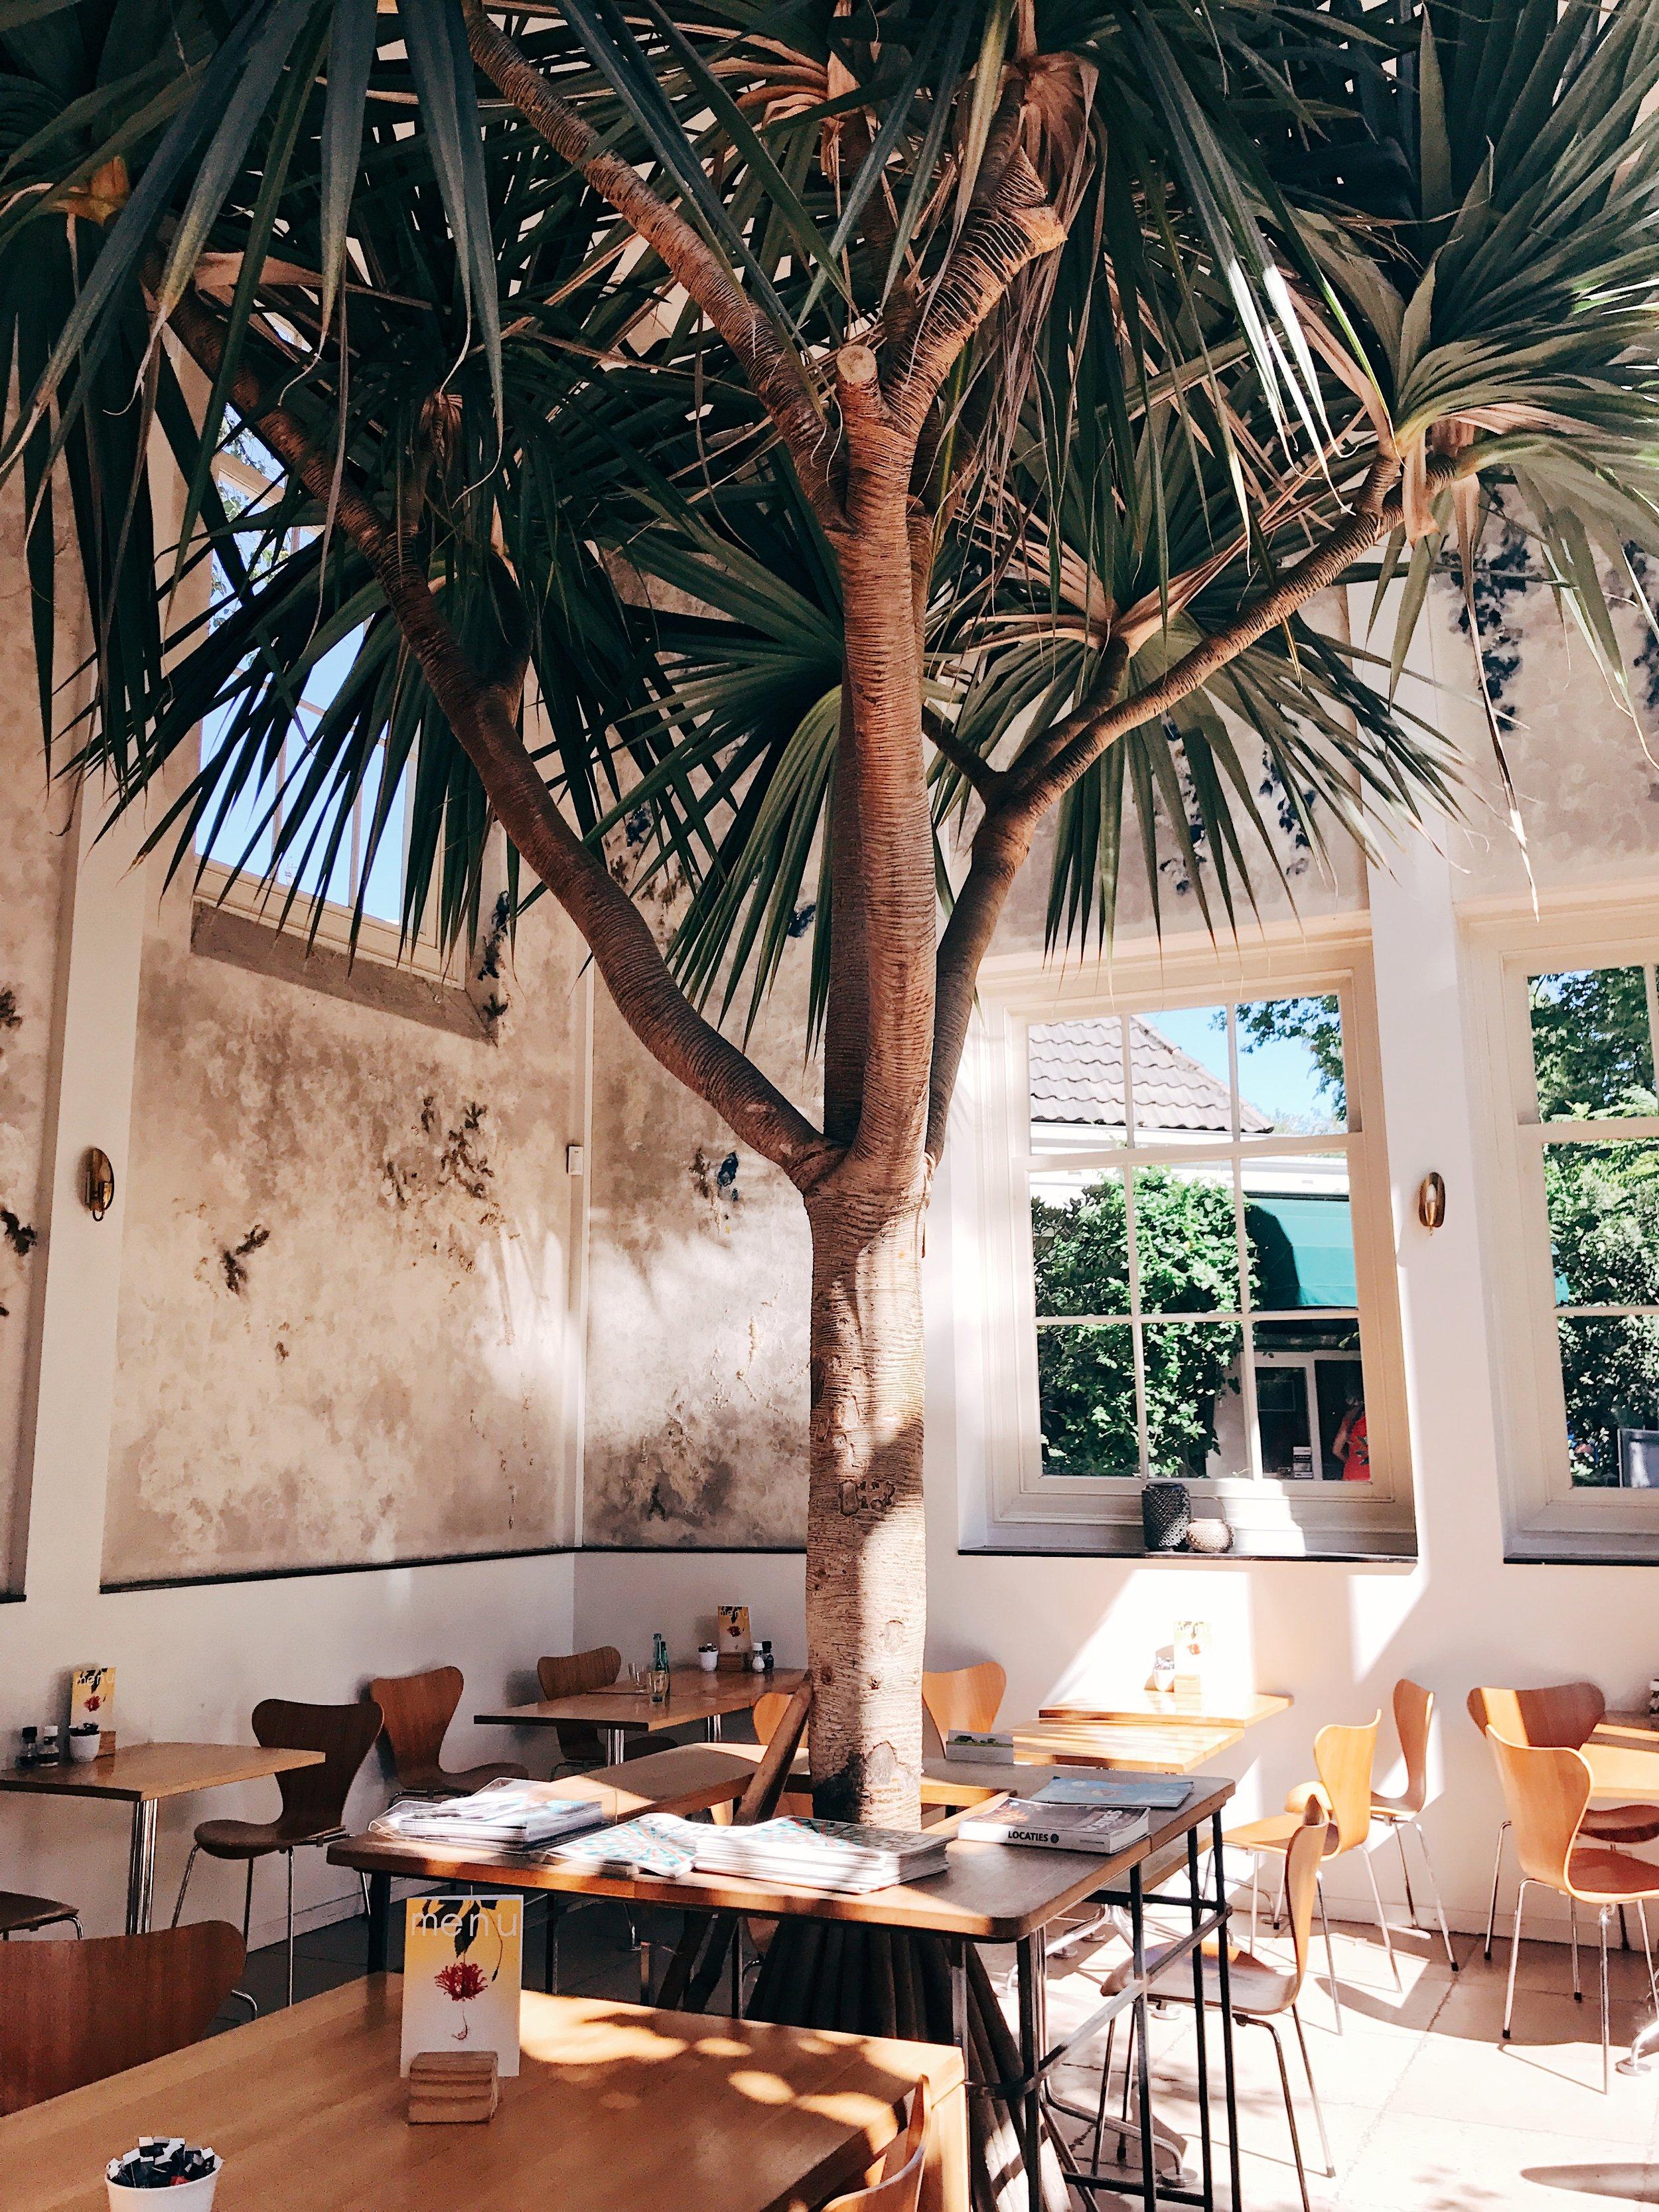 The cafe at Hortus Botanicus